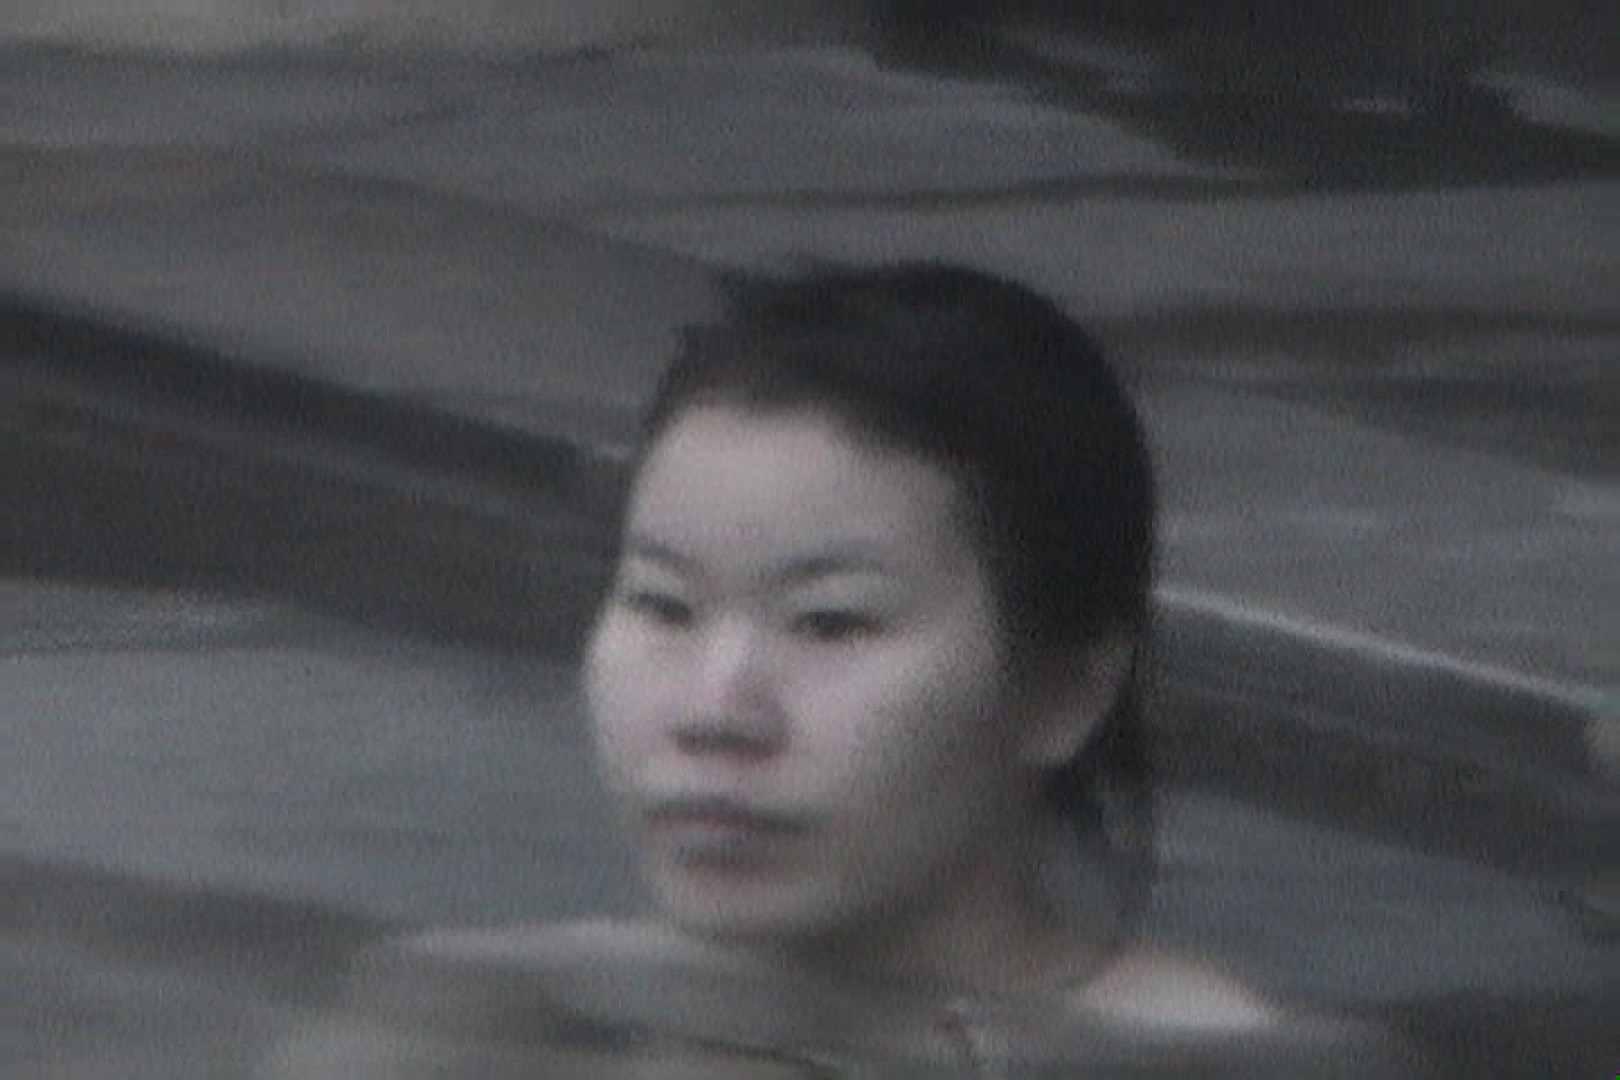 Aquaな露天風呂Vol.556 露天風呂突入 | 盗撮師作品  69pic 10